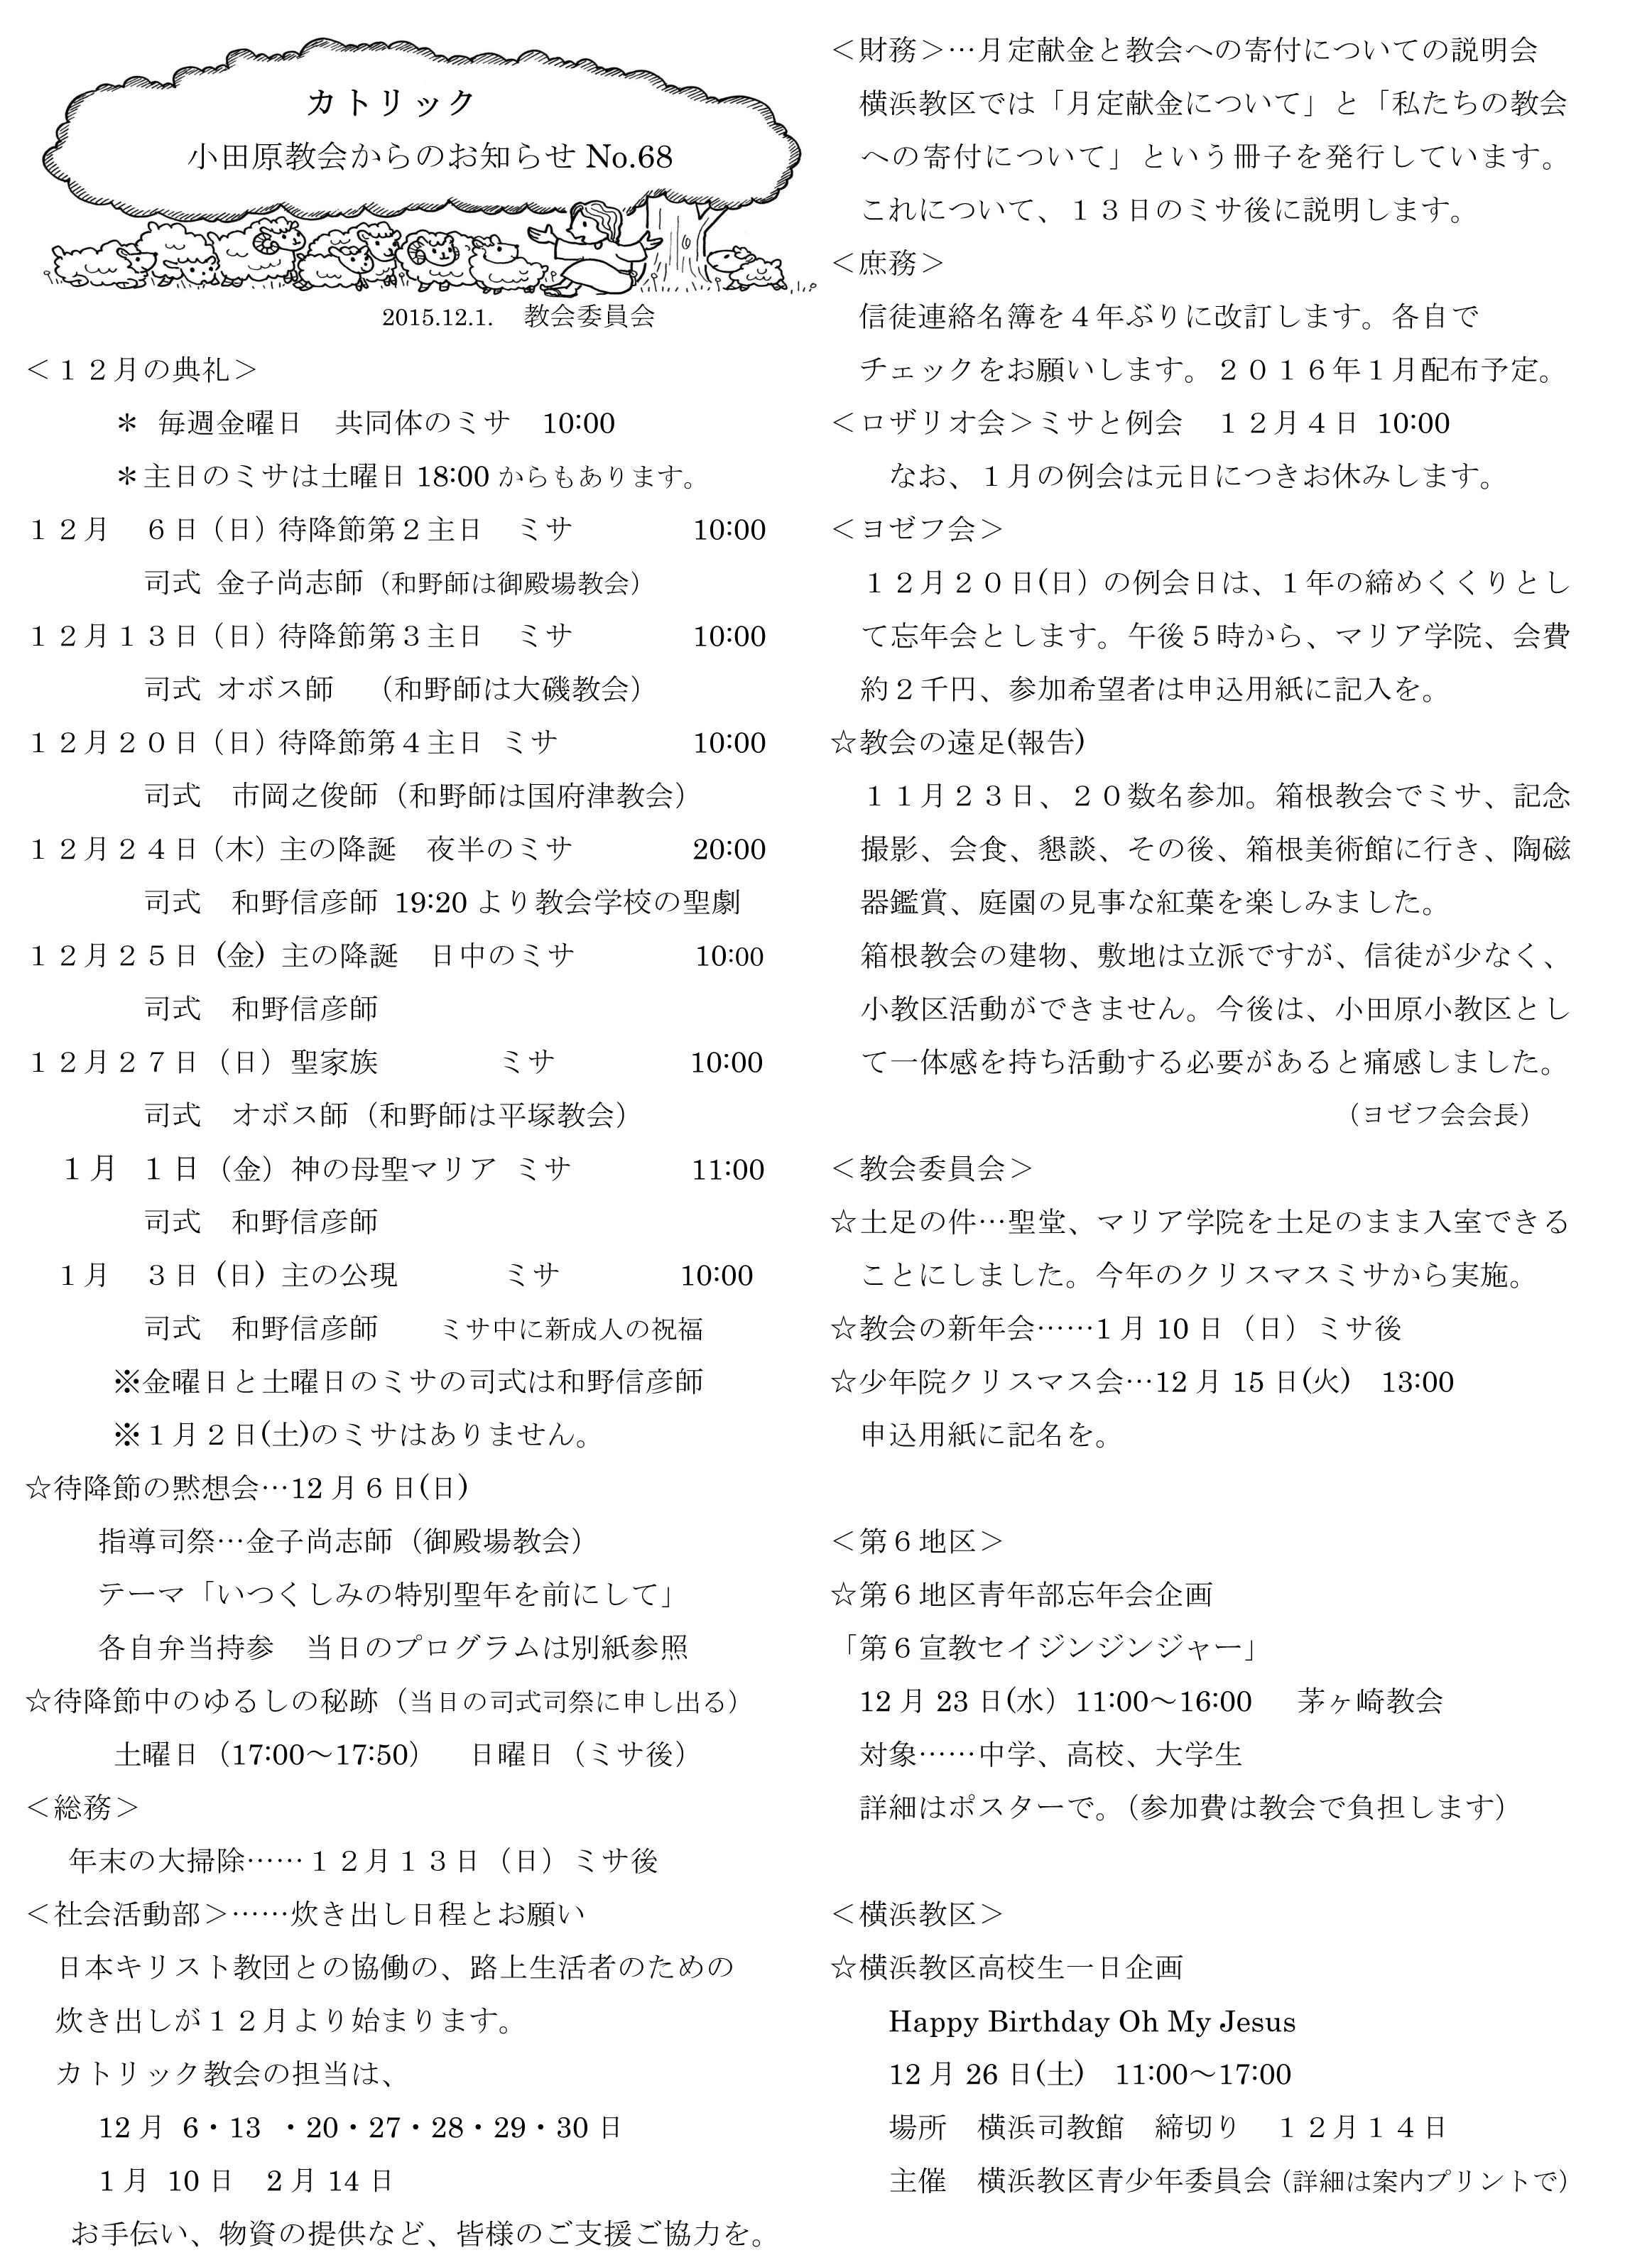 Microsoft Word - 月報68号(改訂版).docx